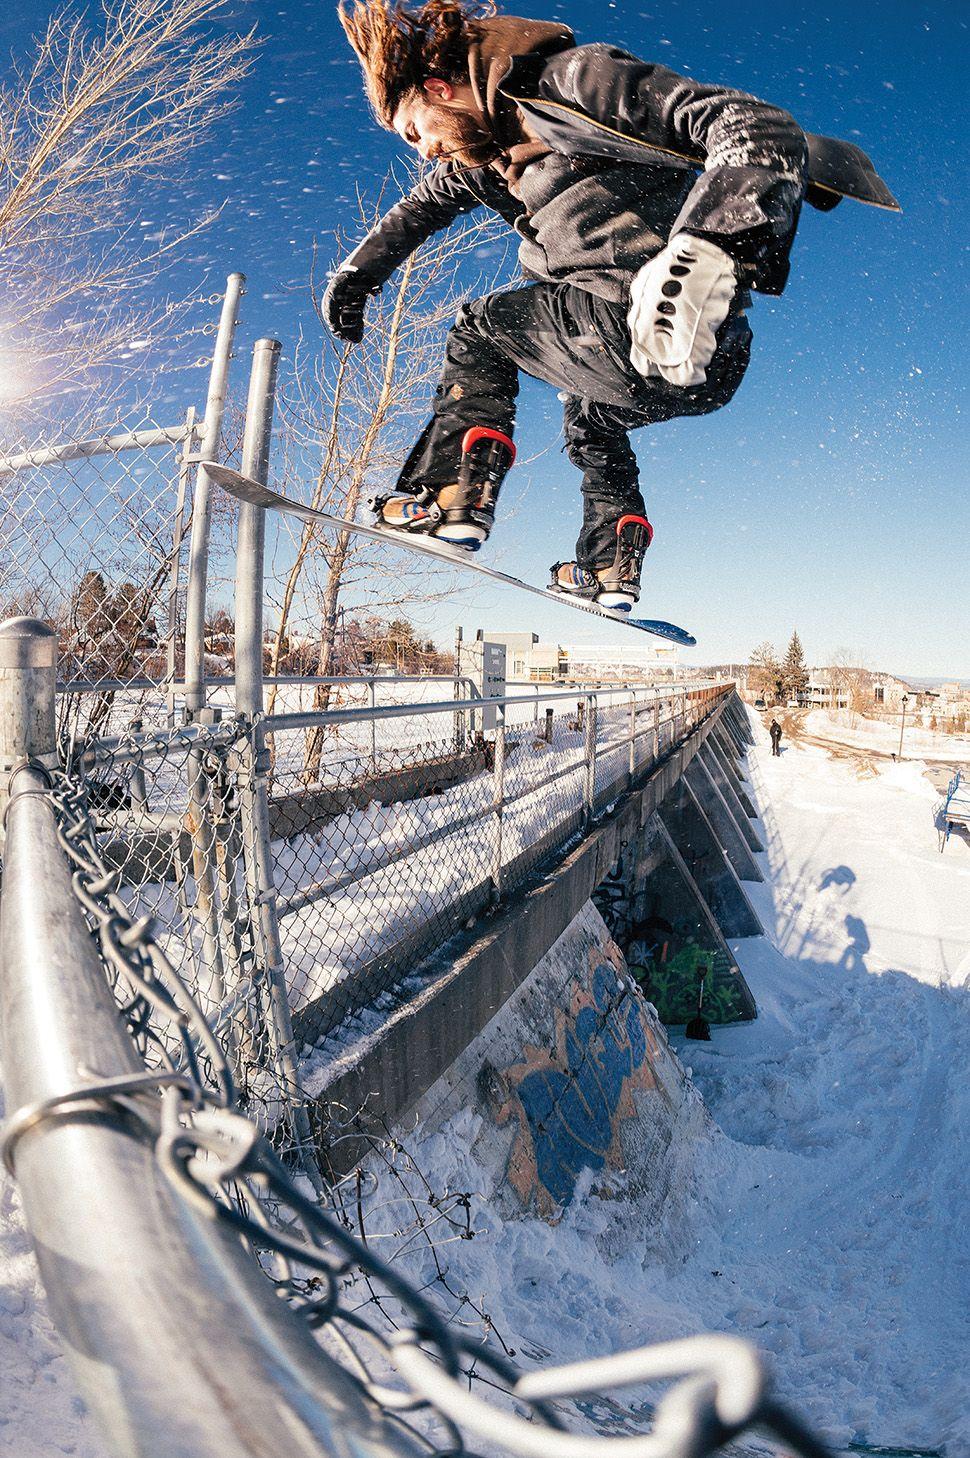 adidas Snowboarding Autumn/Winter 2015 Lookbook - EU Kicks: Sneaker Magazine